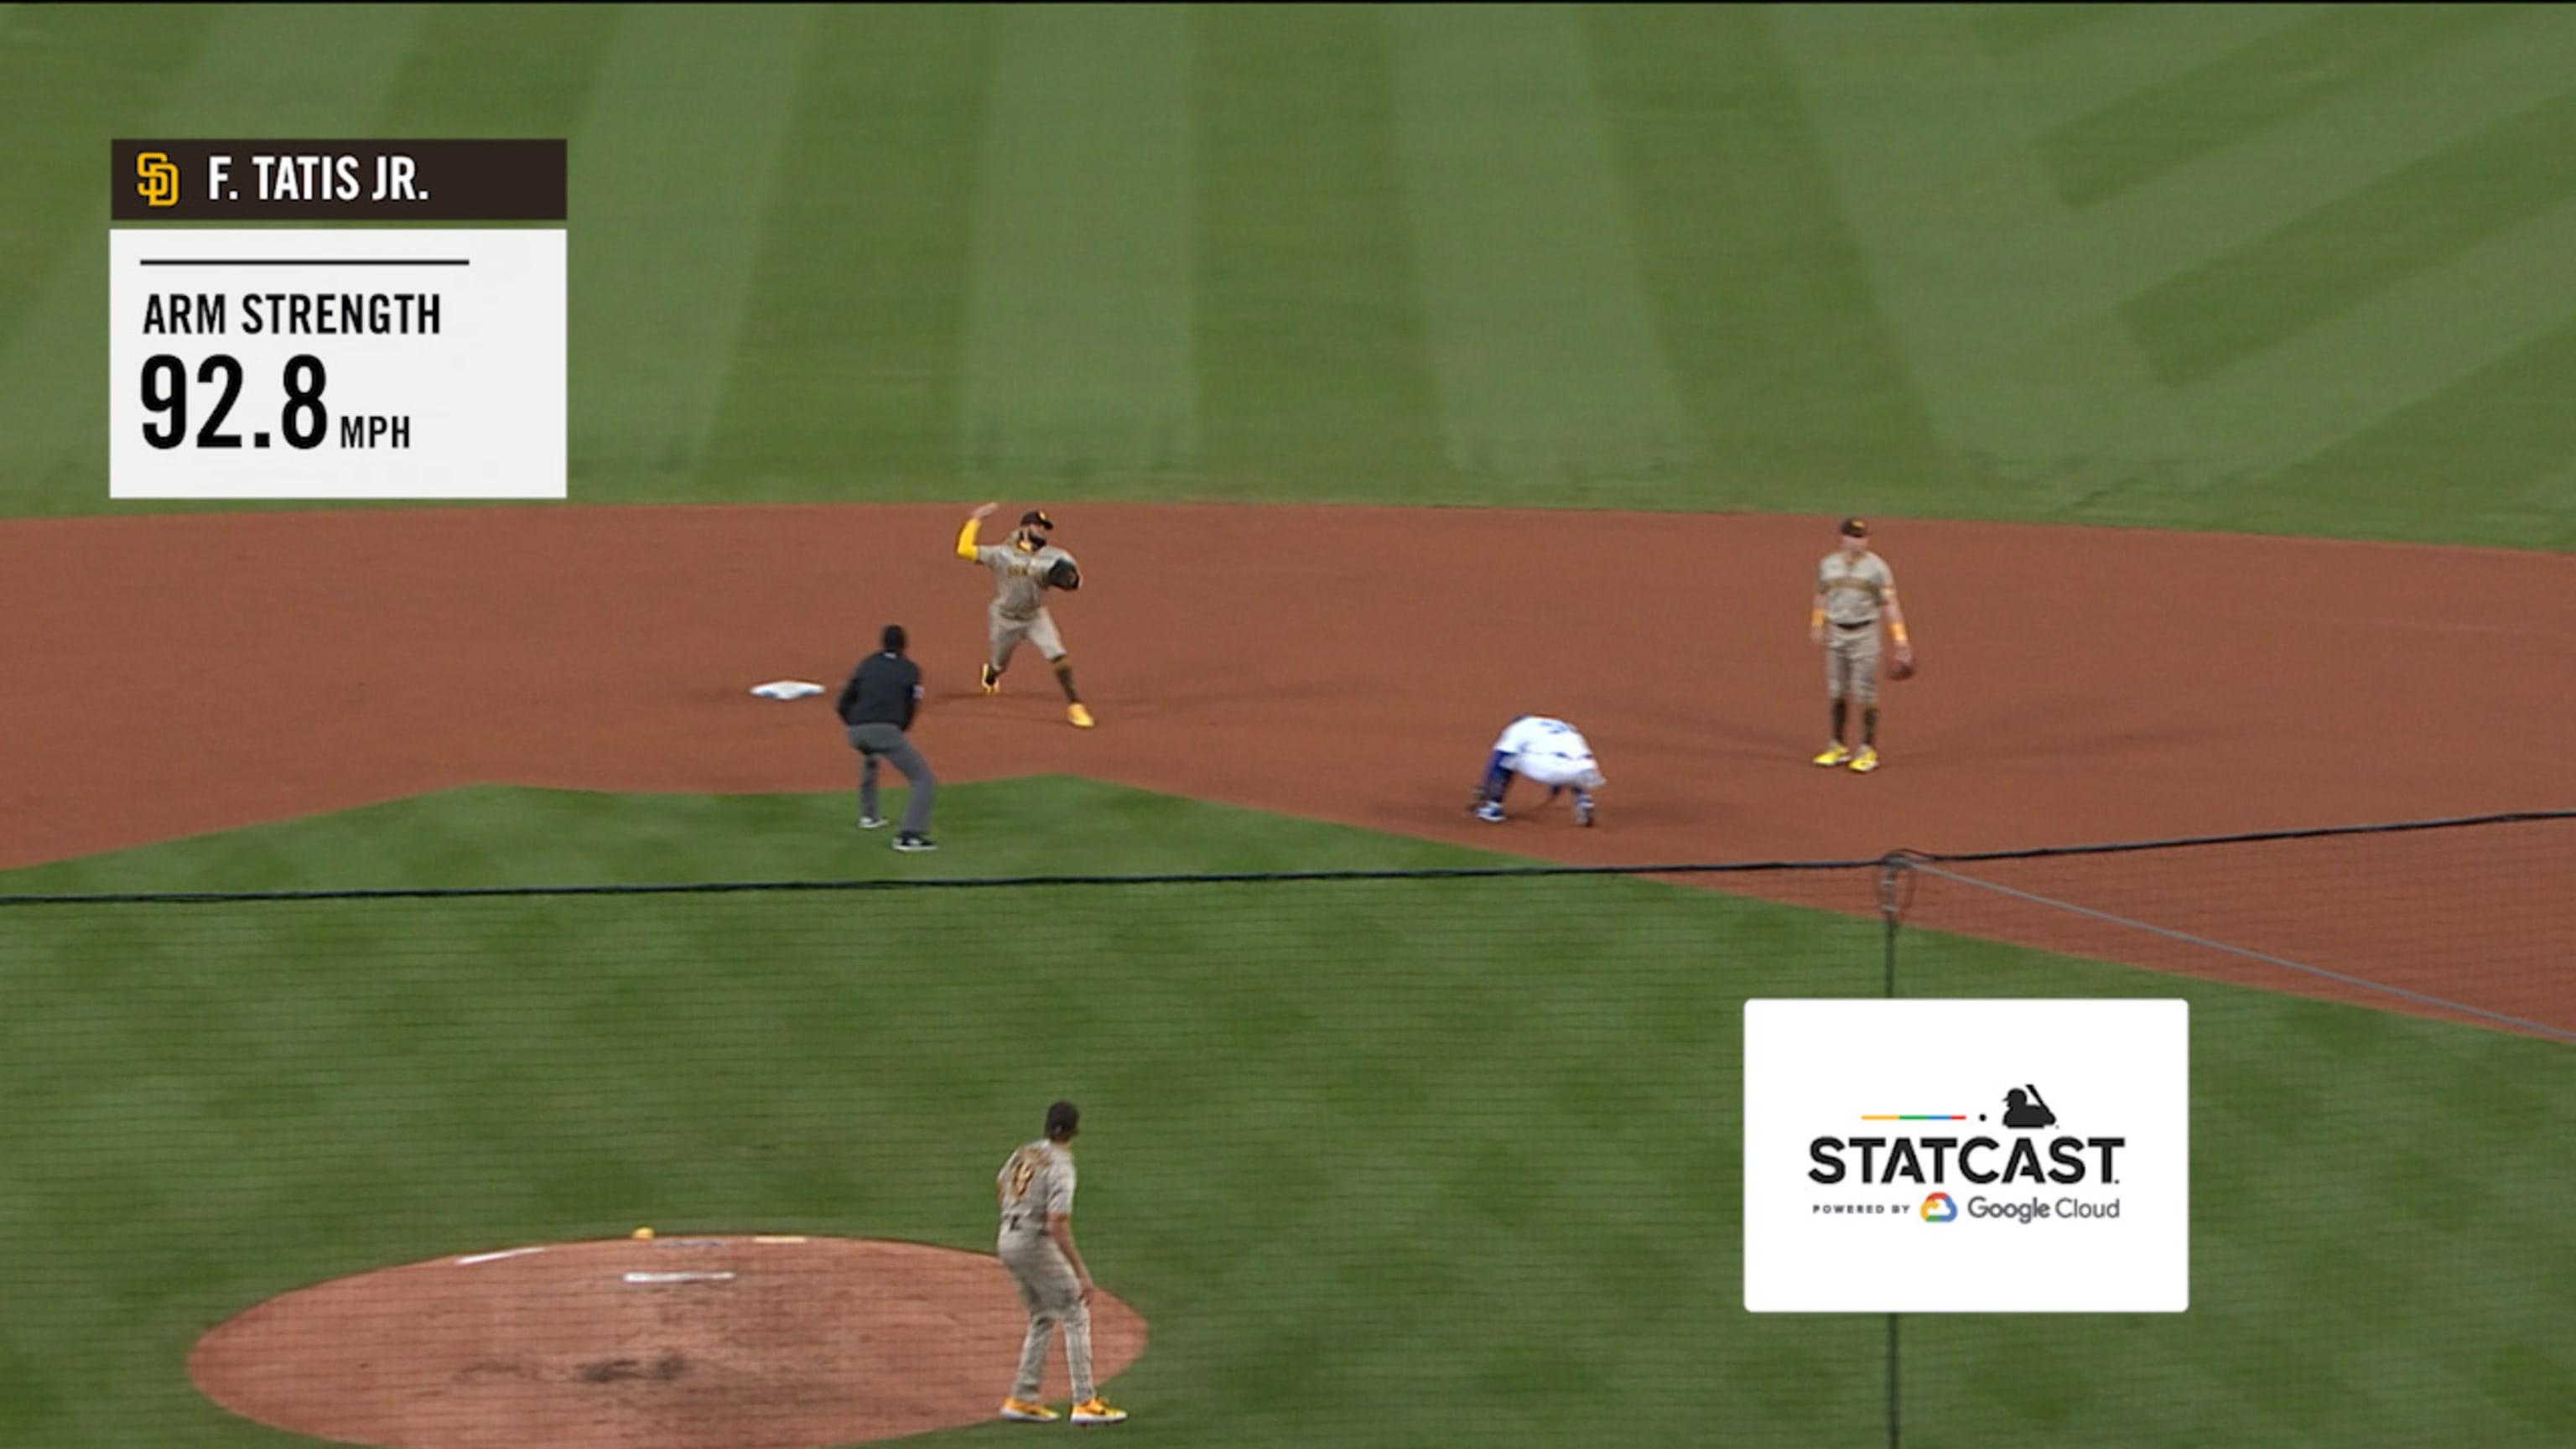 Tatis Jr. saca tiro de 92.8 mph